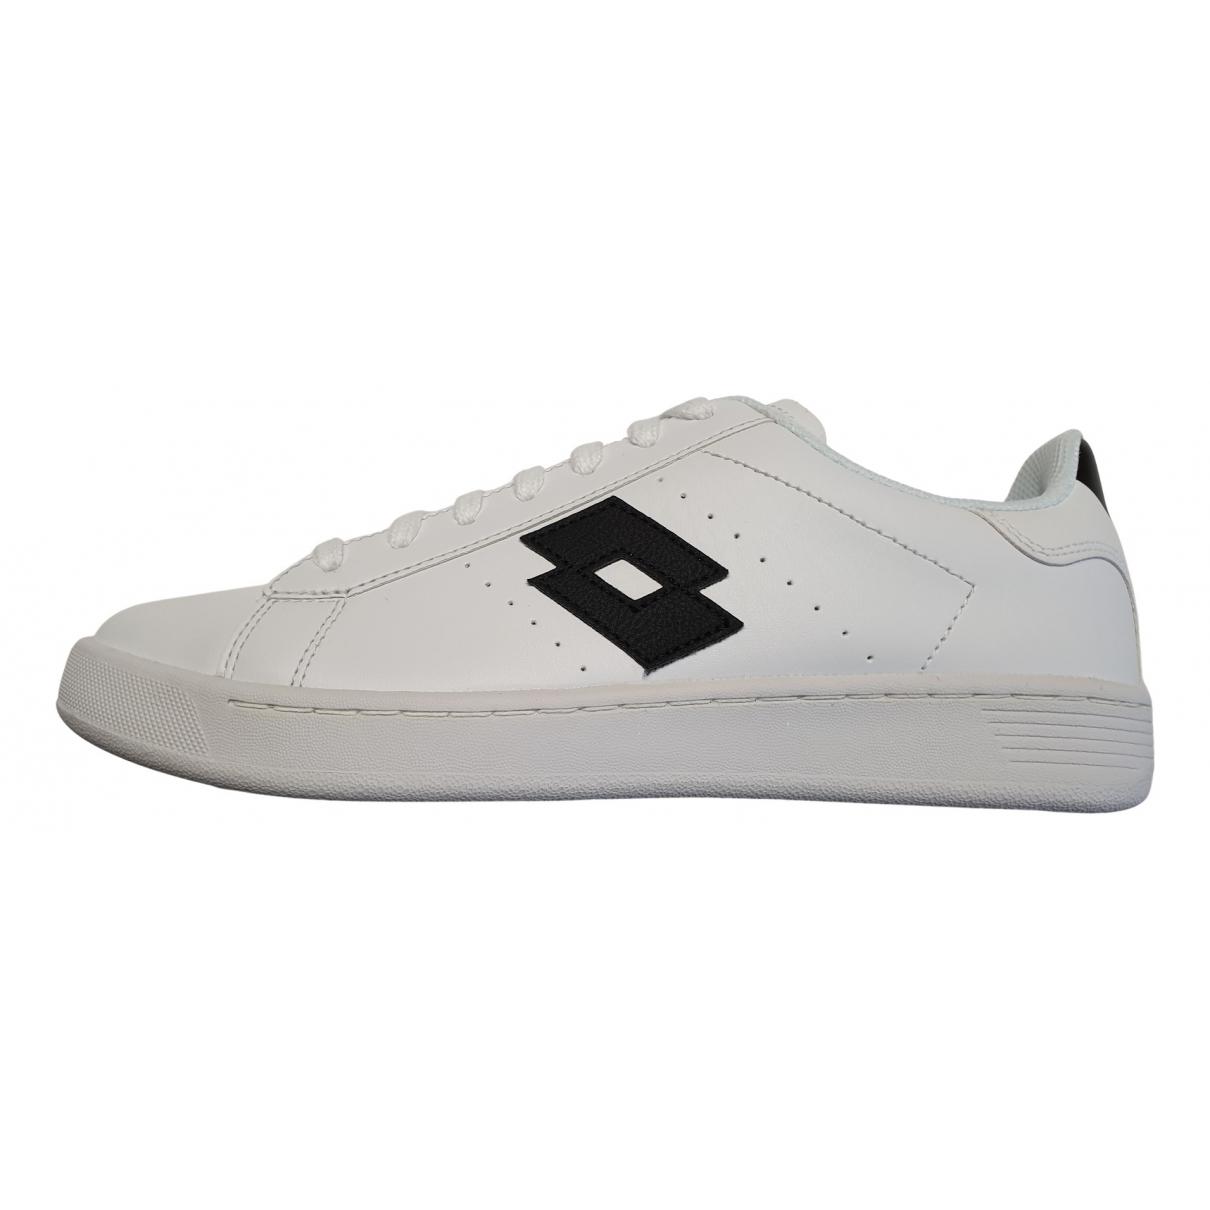 Lotto \N Sneakers in  Weiss Leder